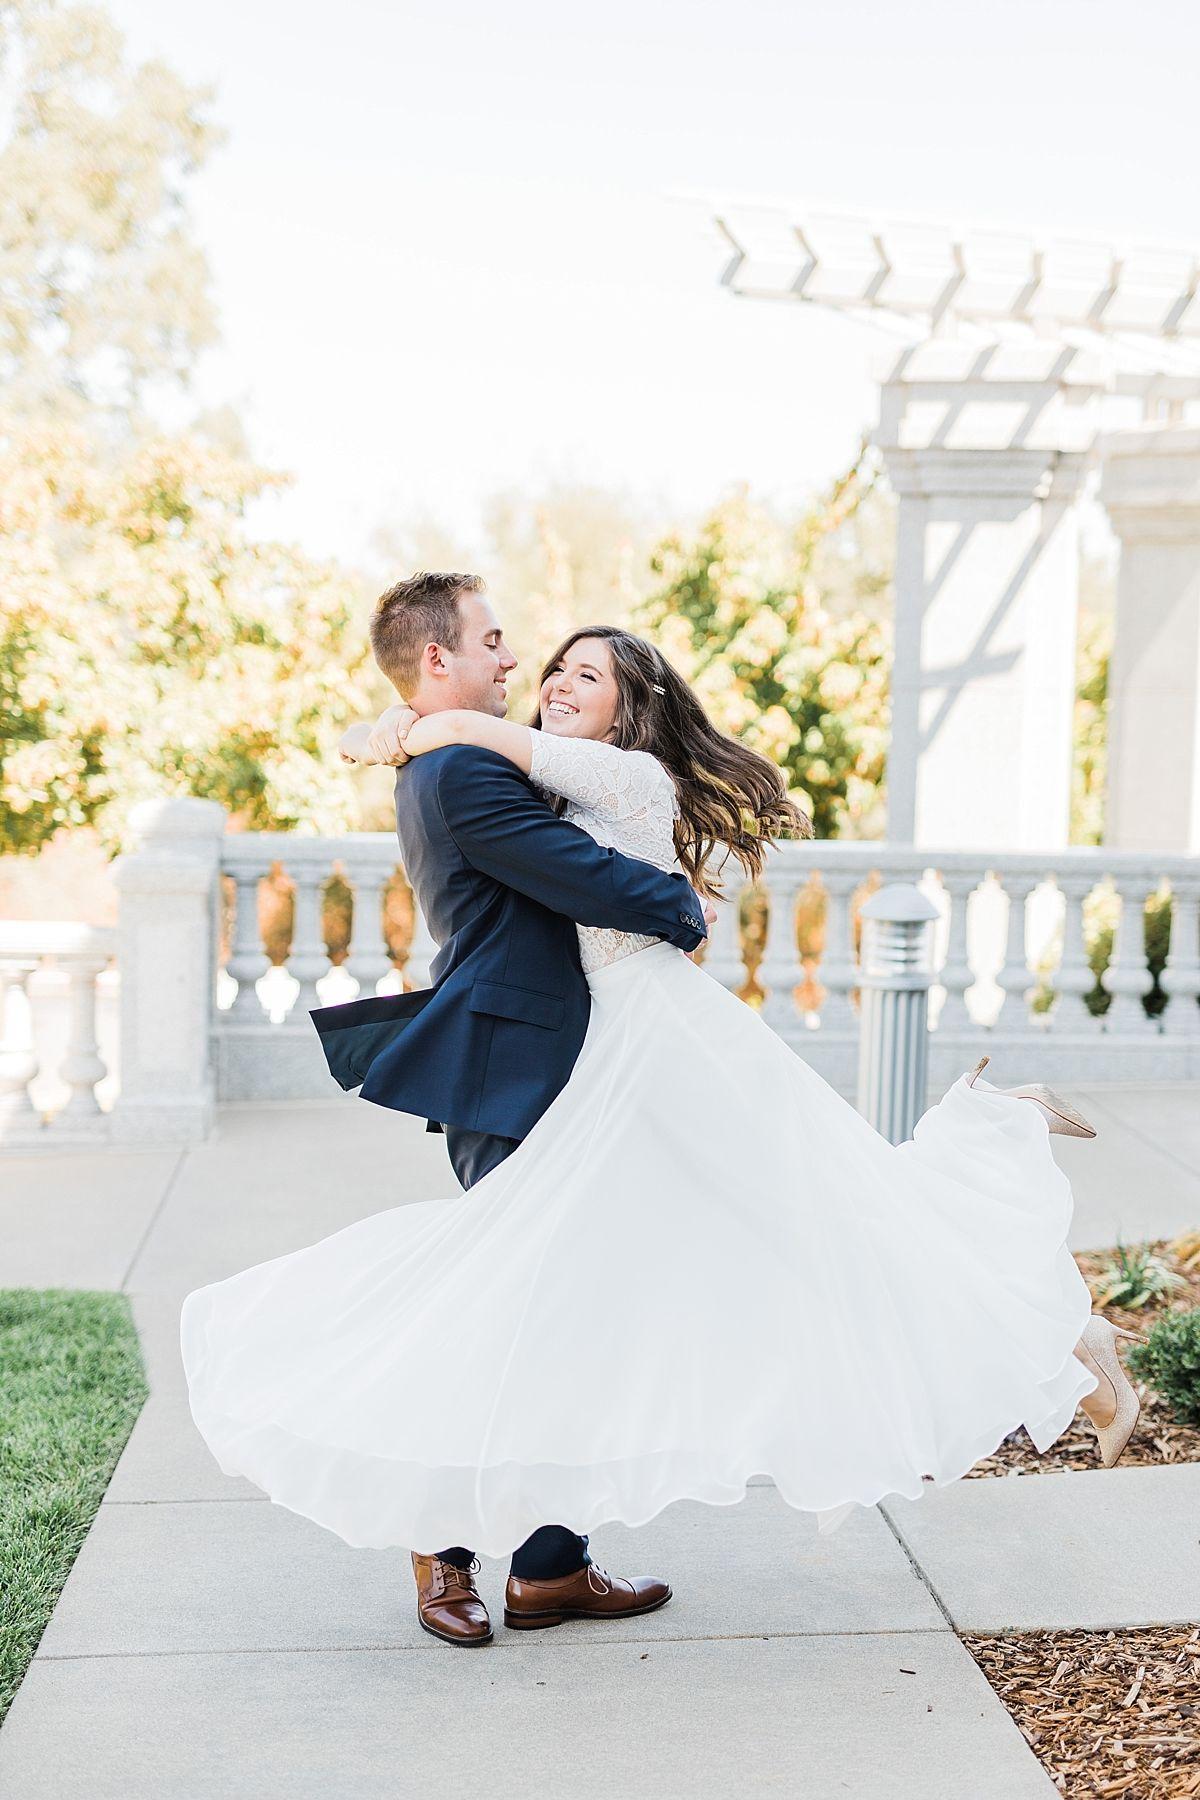 Backyard Wedding With a MusicallyGifted Bride